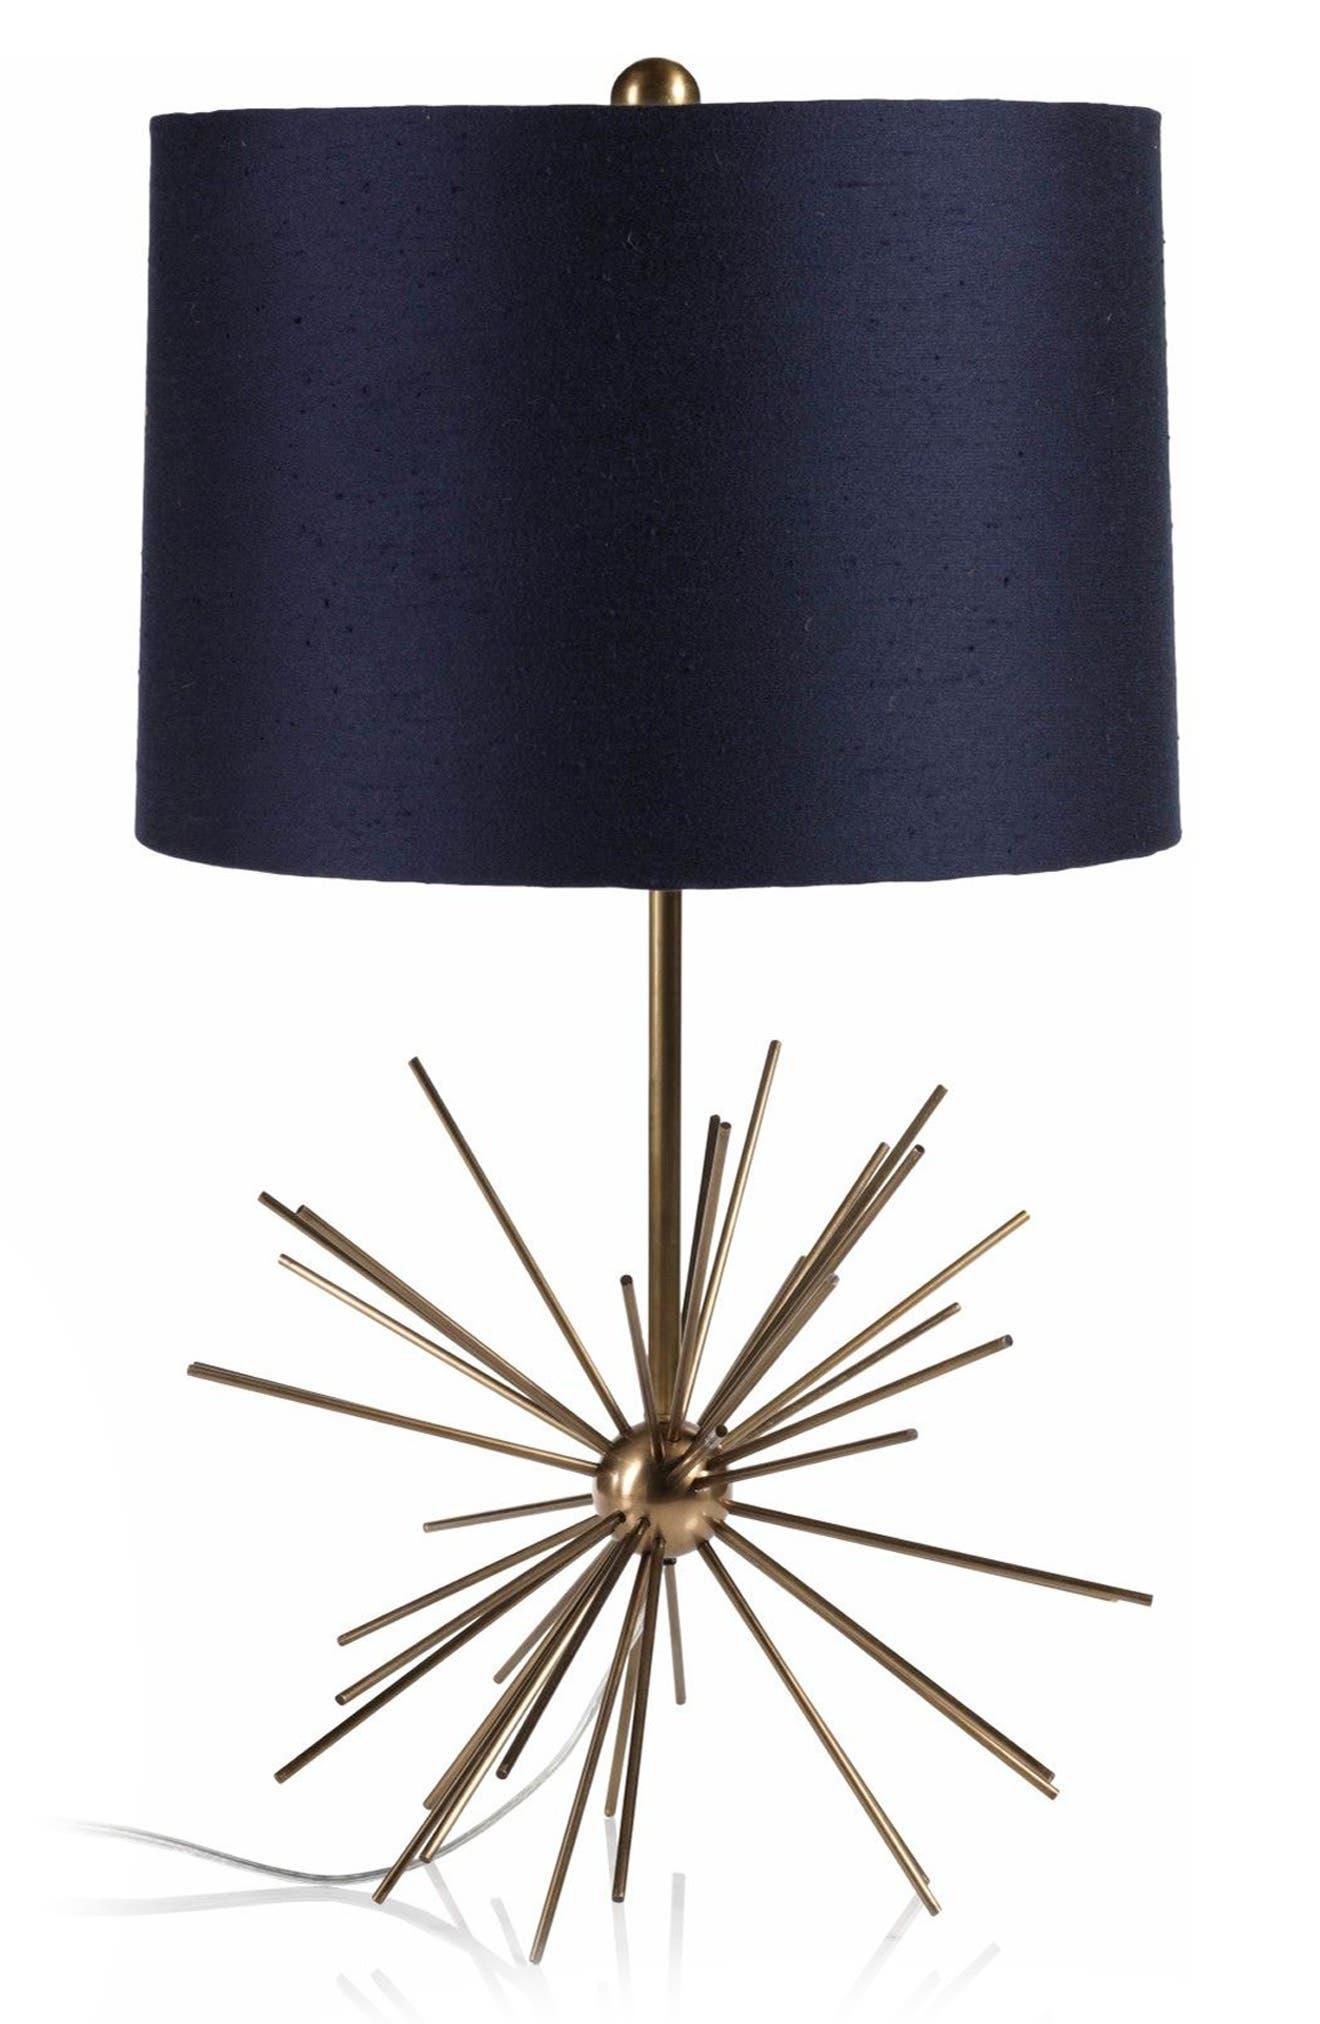 Oslo Table Lamp,                             Main thumbnail 1, color,                             400